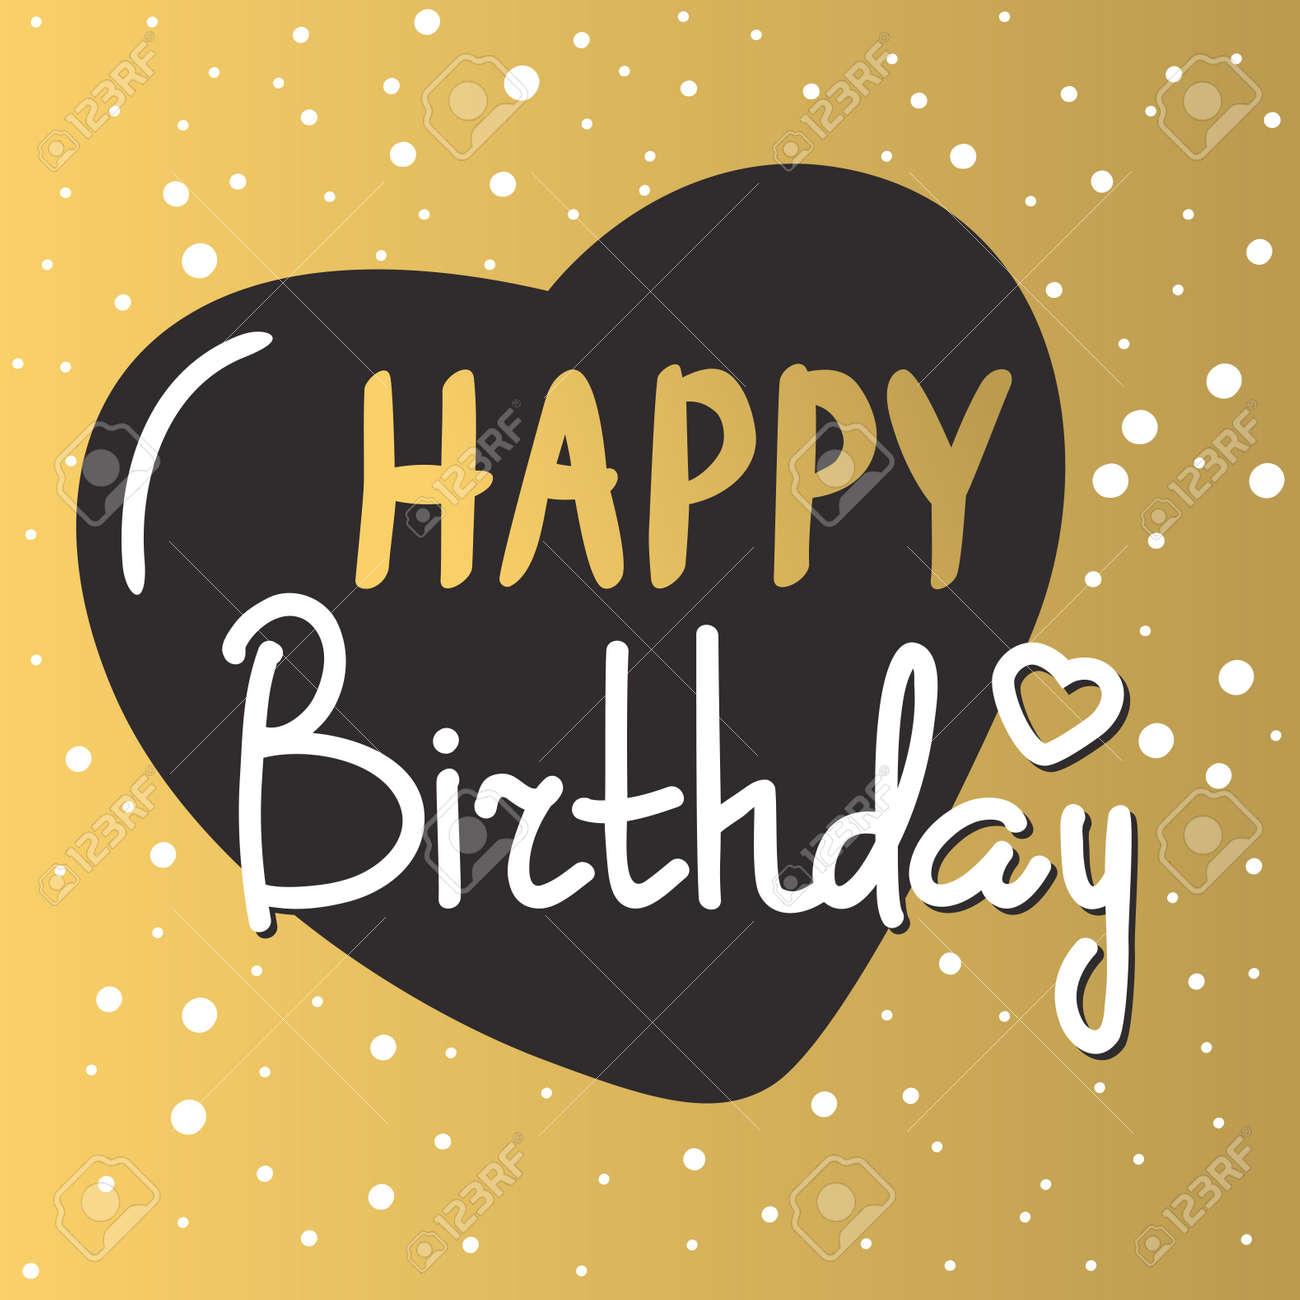 Beautiful birthday invitation cards design gold and black colors beautiful birthday invitation cards design gold and black colors birthday vector greeting card decoration filmwisefo